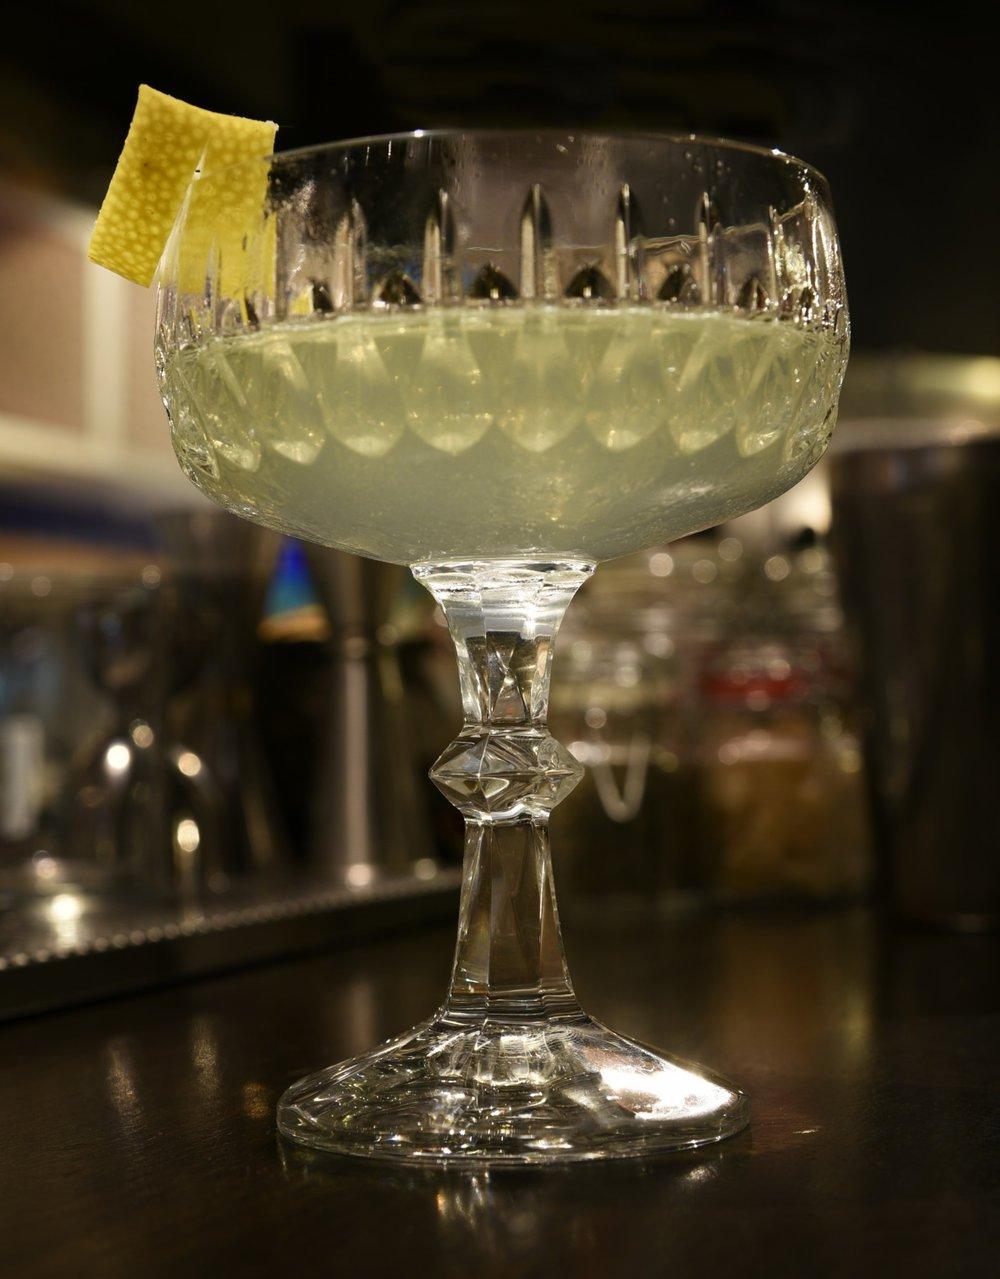 Death's It: 40 mL Cocchi bianco, 30 mL Death's Door whiskey, 20 mL Chartreause Verde, 10 mL, Cardamomo syrup, Zest limone --- stir and strain